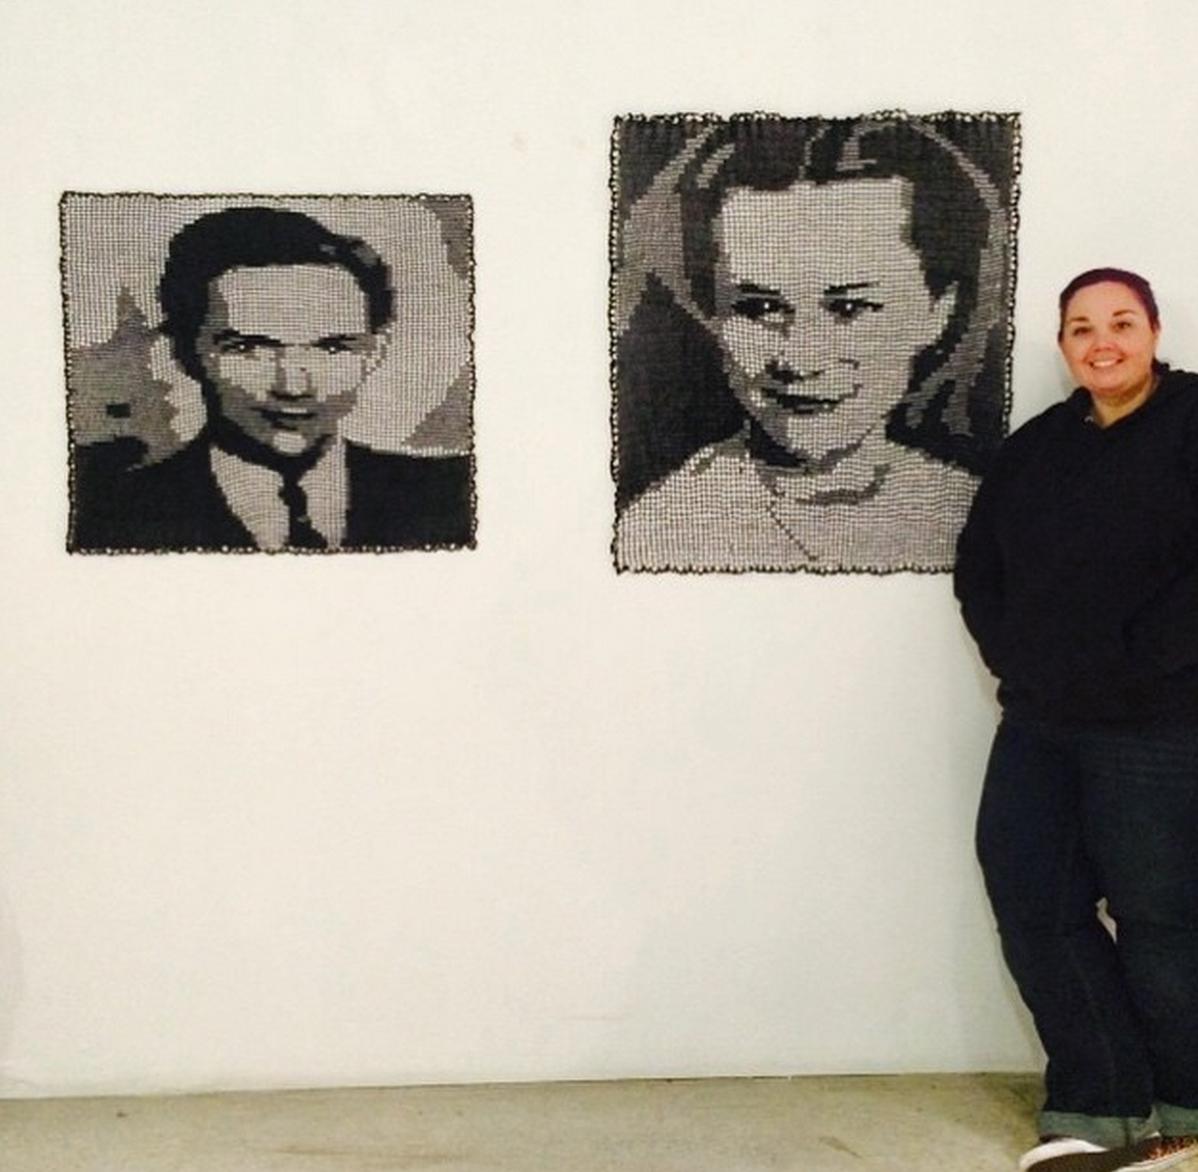 filet-crochet-portraits-4